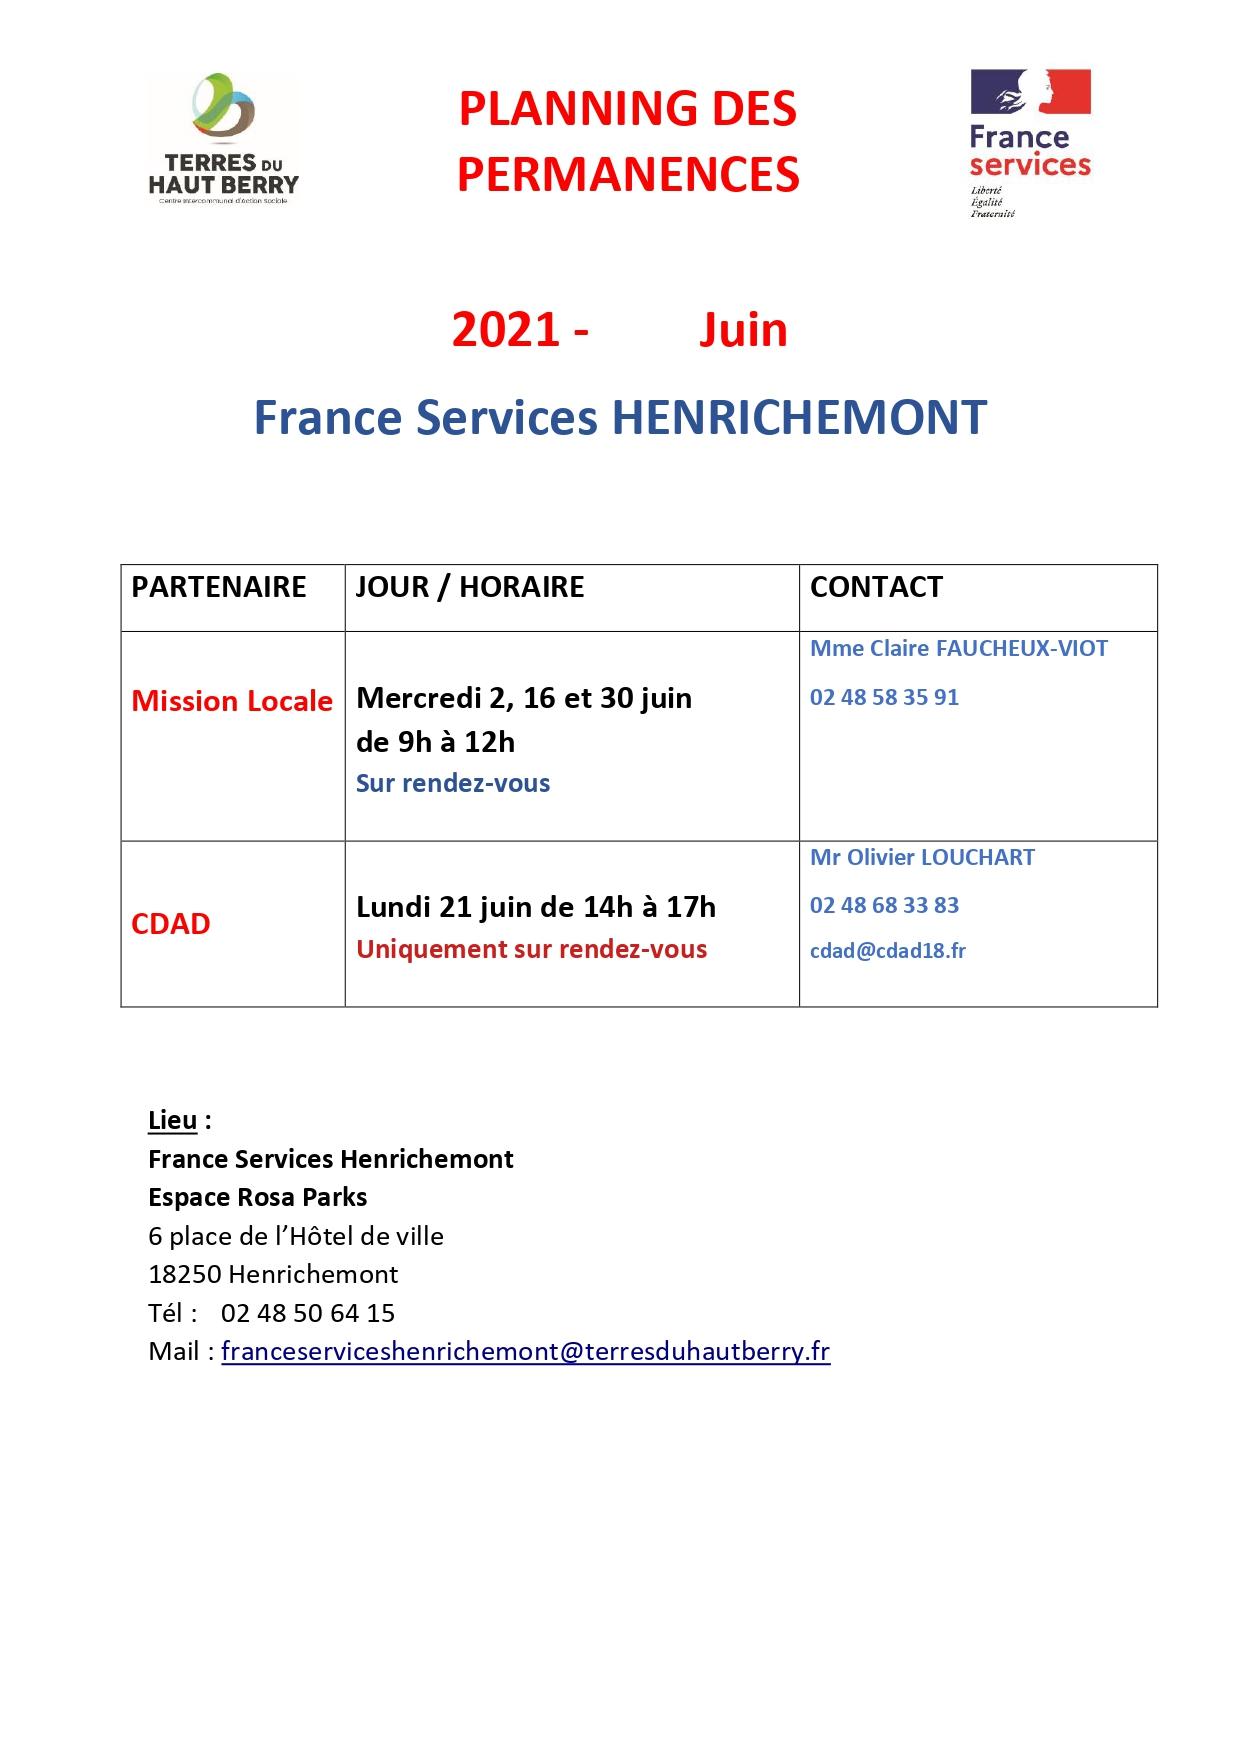 permanence Henrichemont Juin 2021_page-0001 (1)